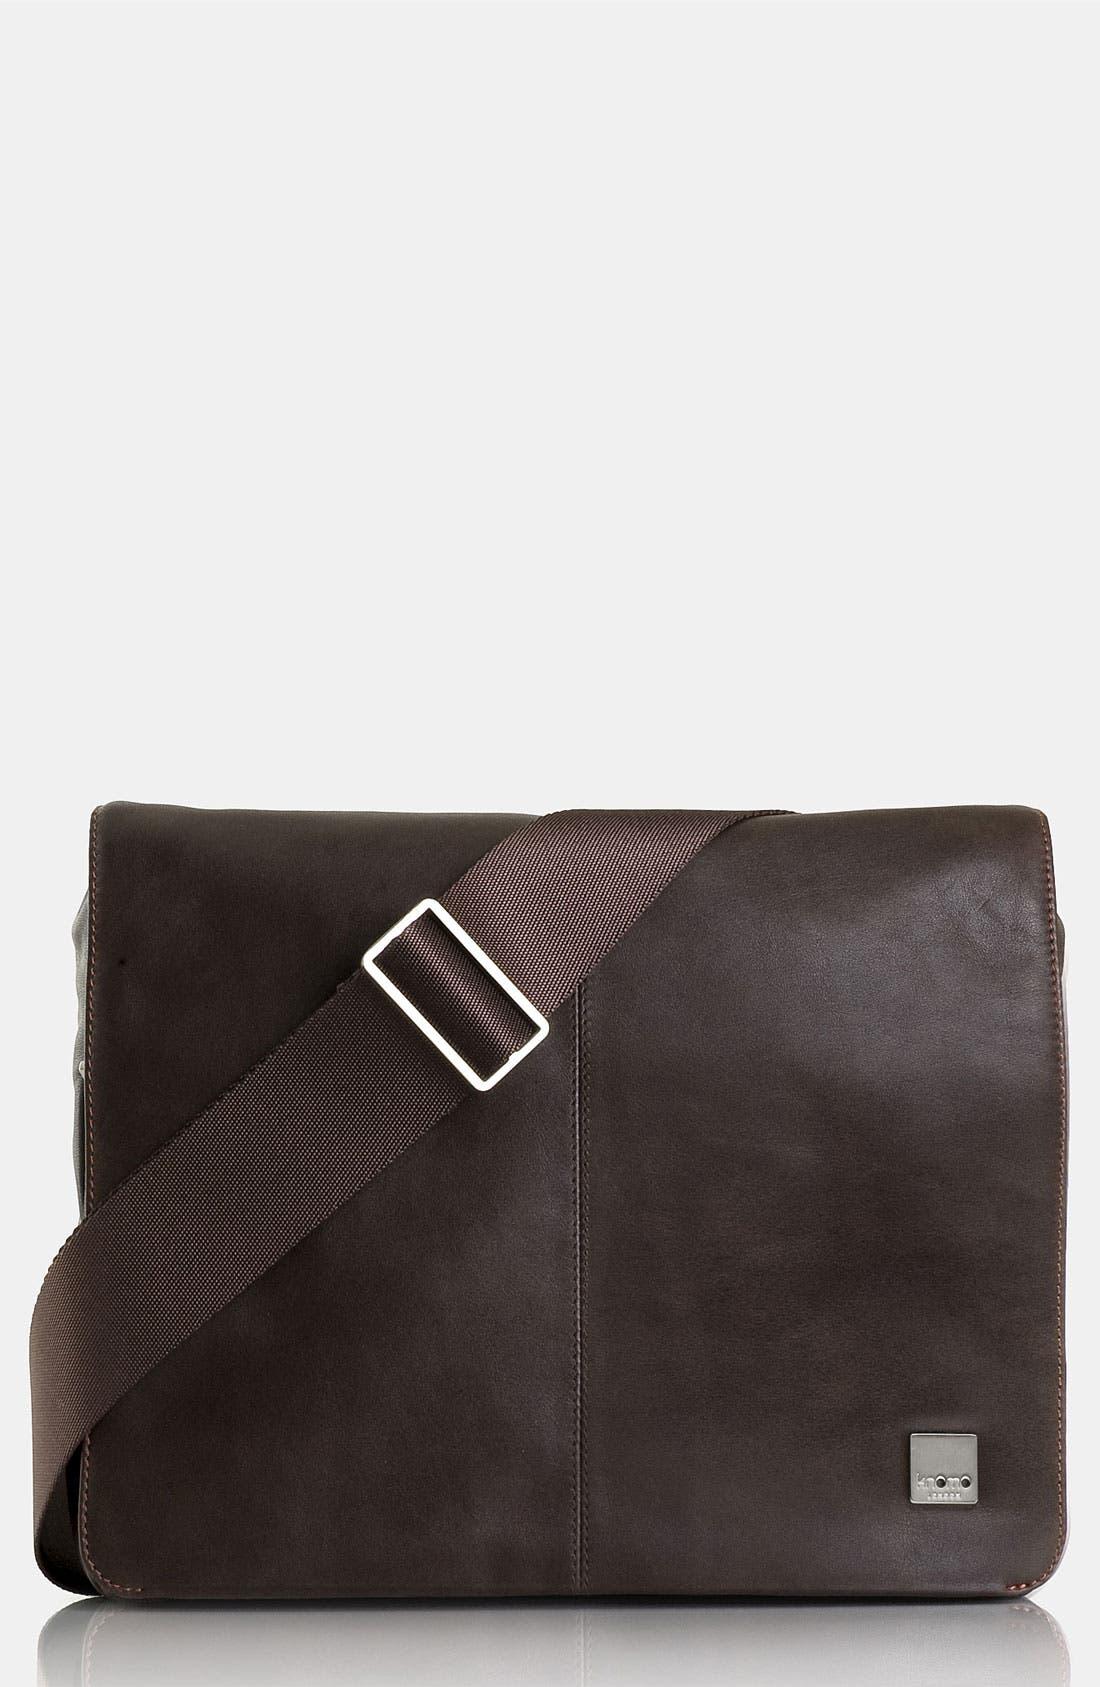 Main Image - KNOMO London 'Kilkenny' Messenger Bag (11 Inch)